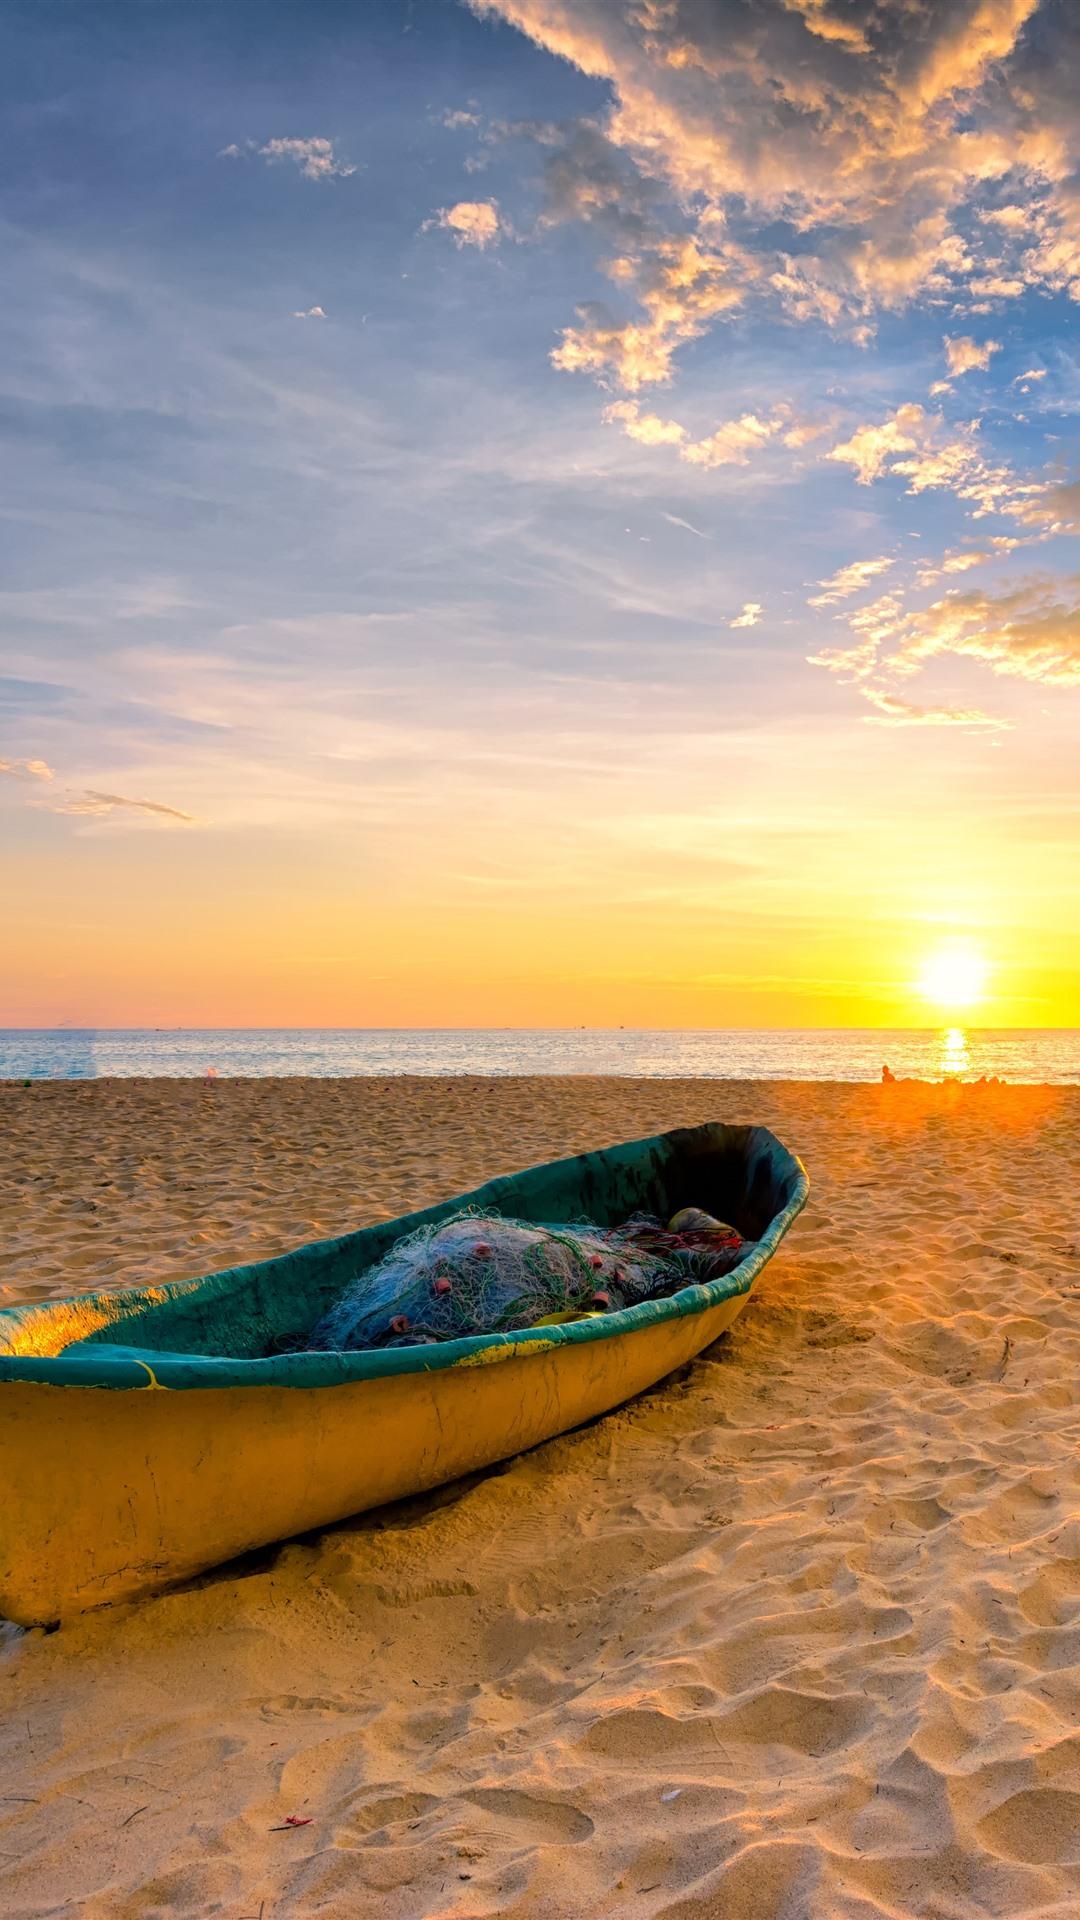 Beach Sands Boat Sea Sunset 1125x2436 Iphone Xs X